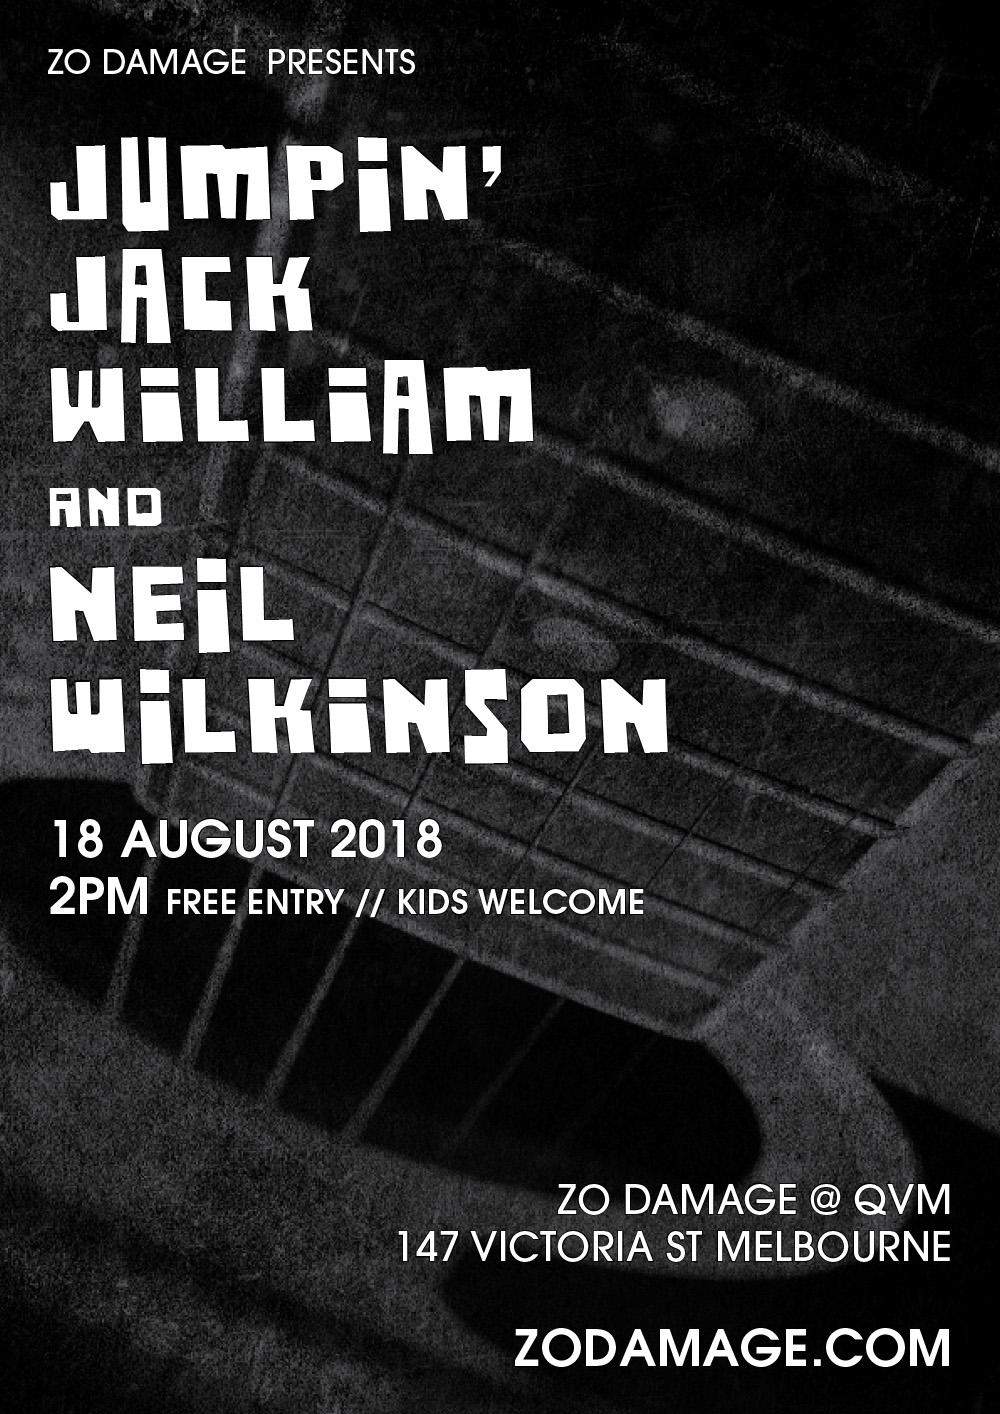 Jack and Neil II.jpg